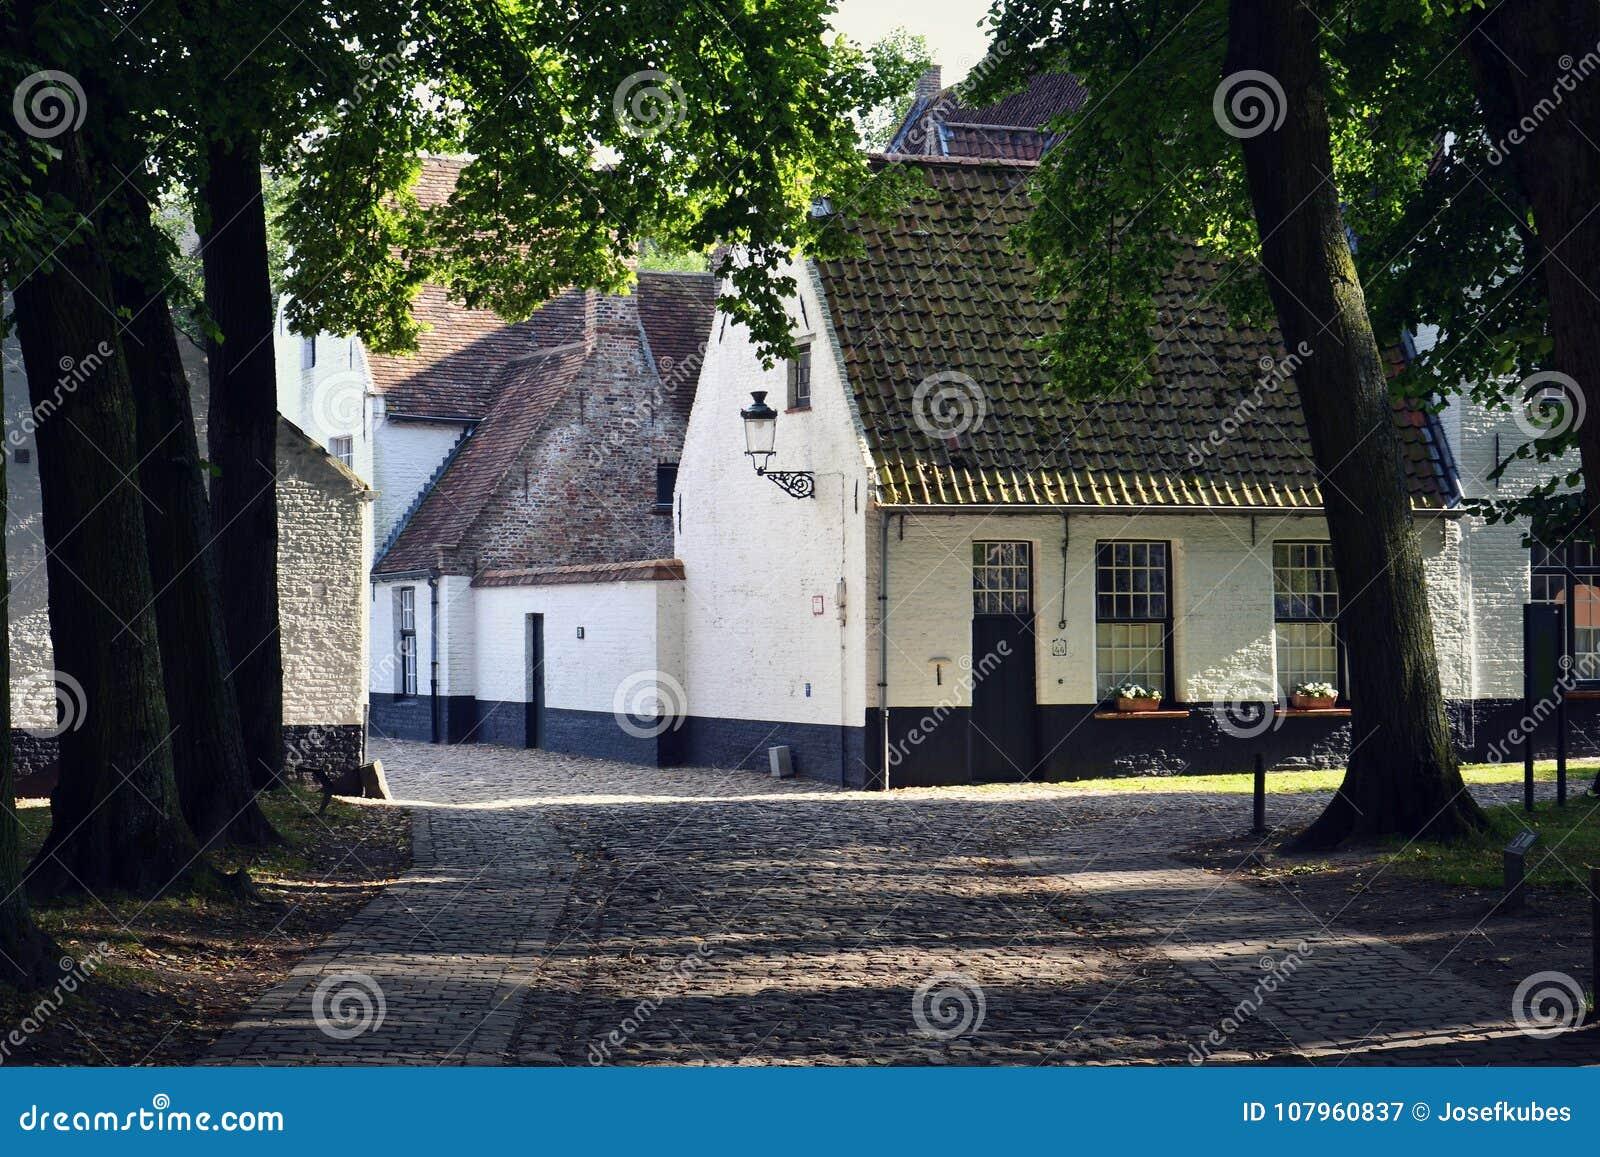 Camere nel complesso principesco di Beguinage dieci Wijngaerde a Bruges, Belgio